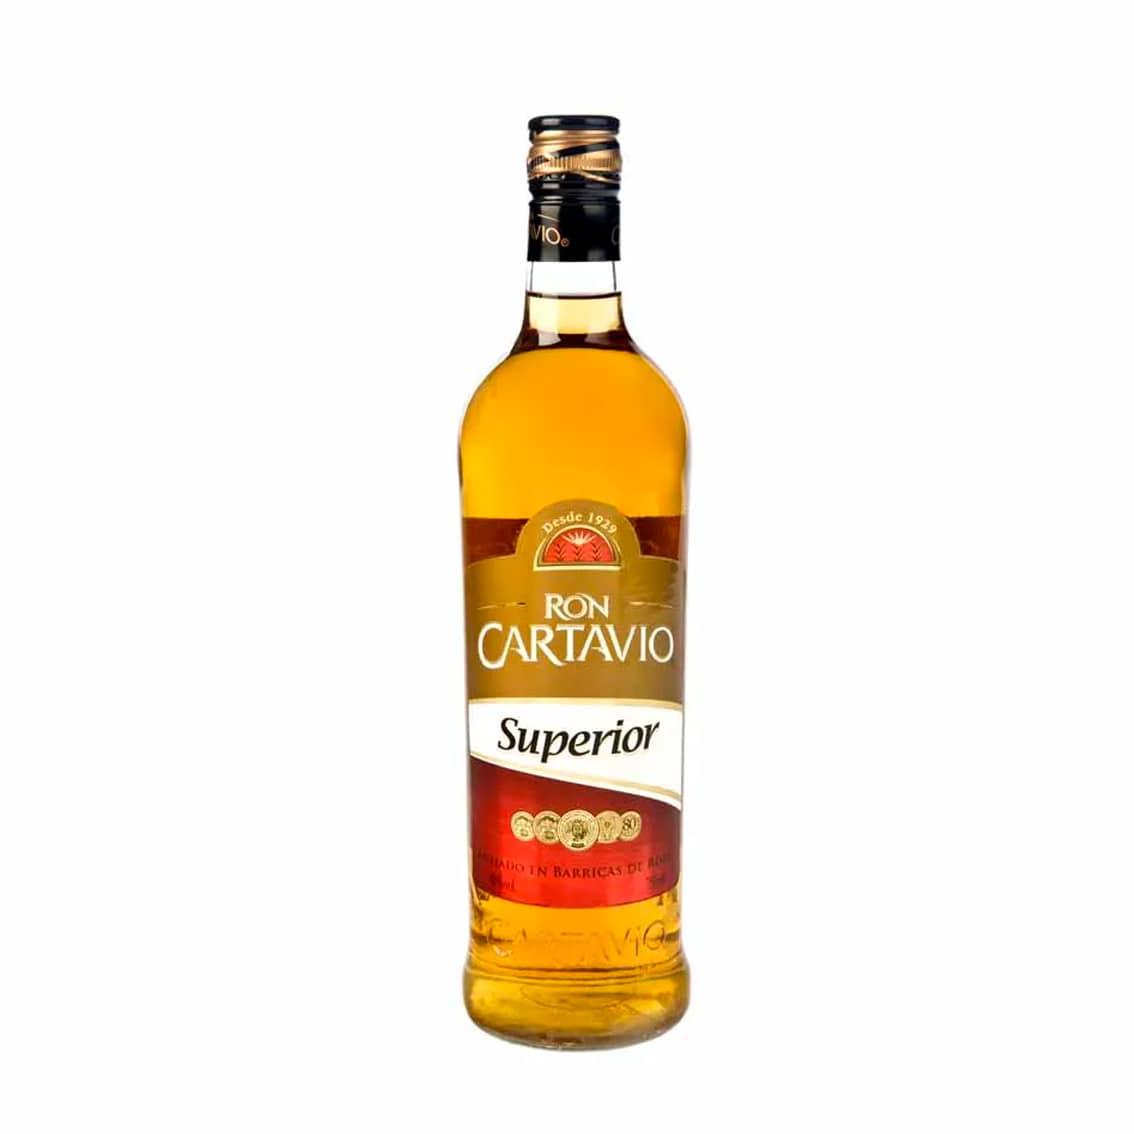 Ron CARTAVIO Superior Botella 750ml